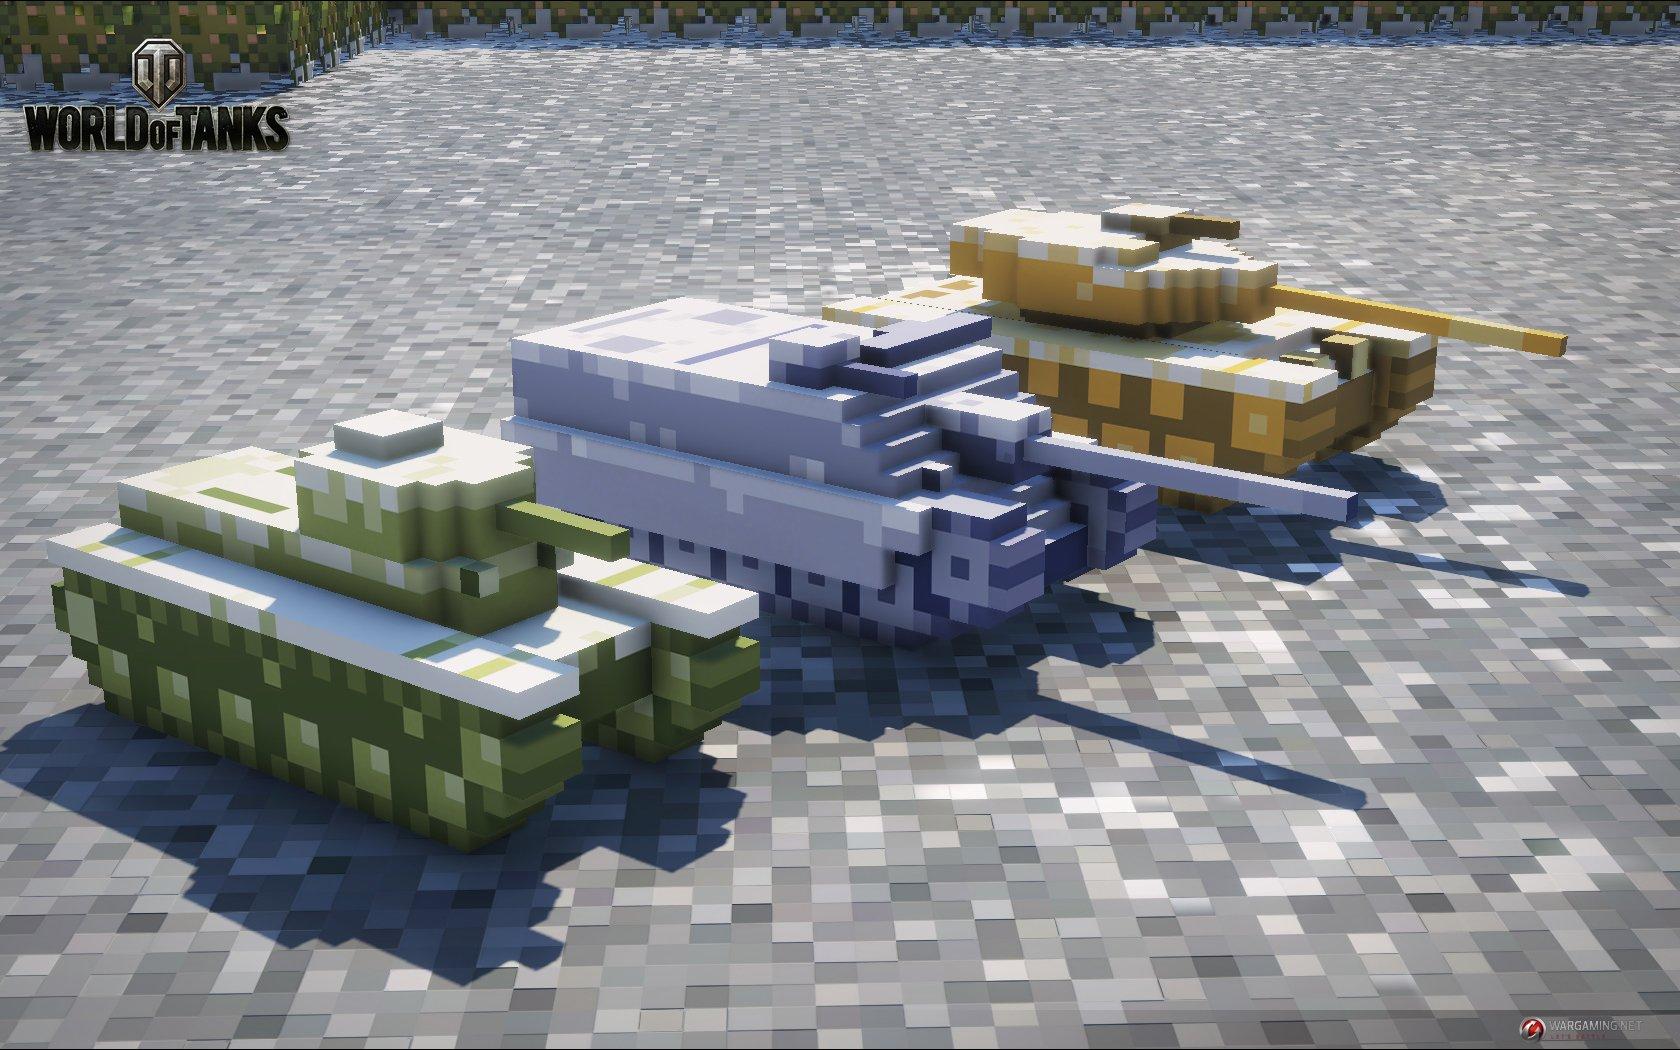 8 bit World of tanks: Зимняя битва. - Изображение 1